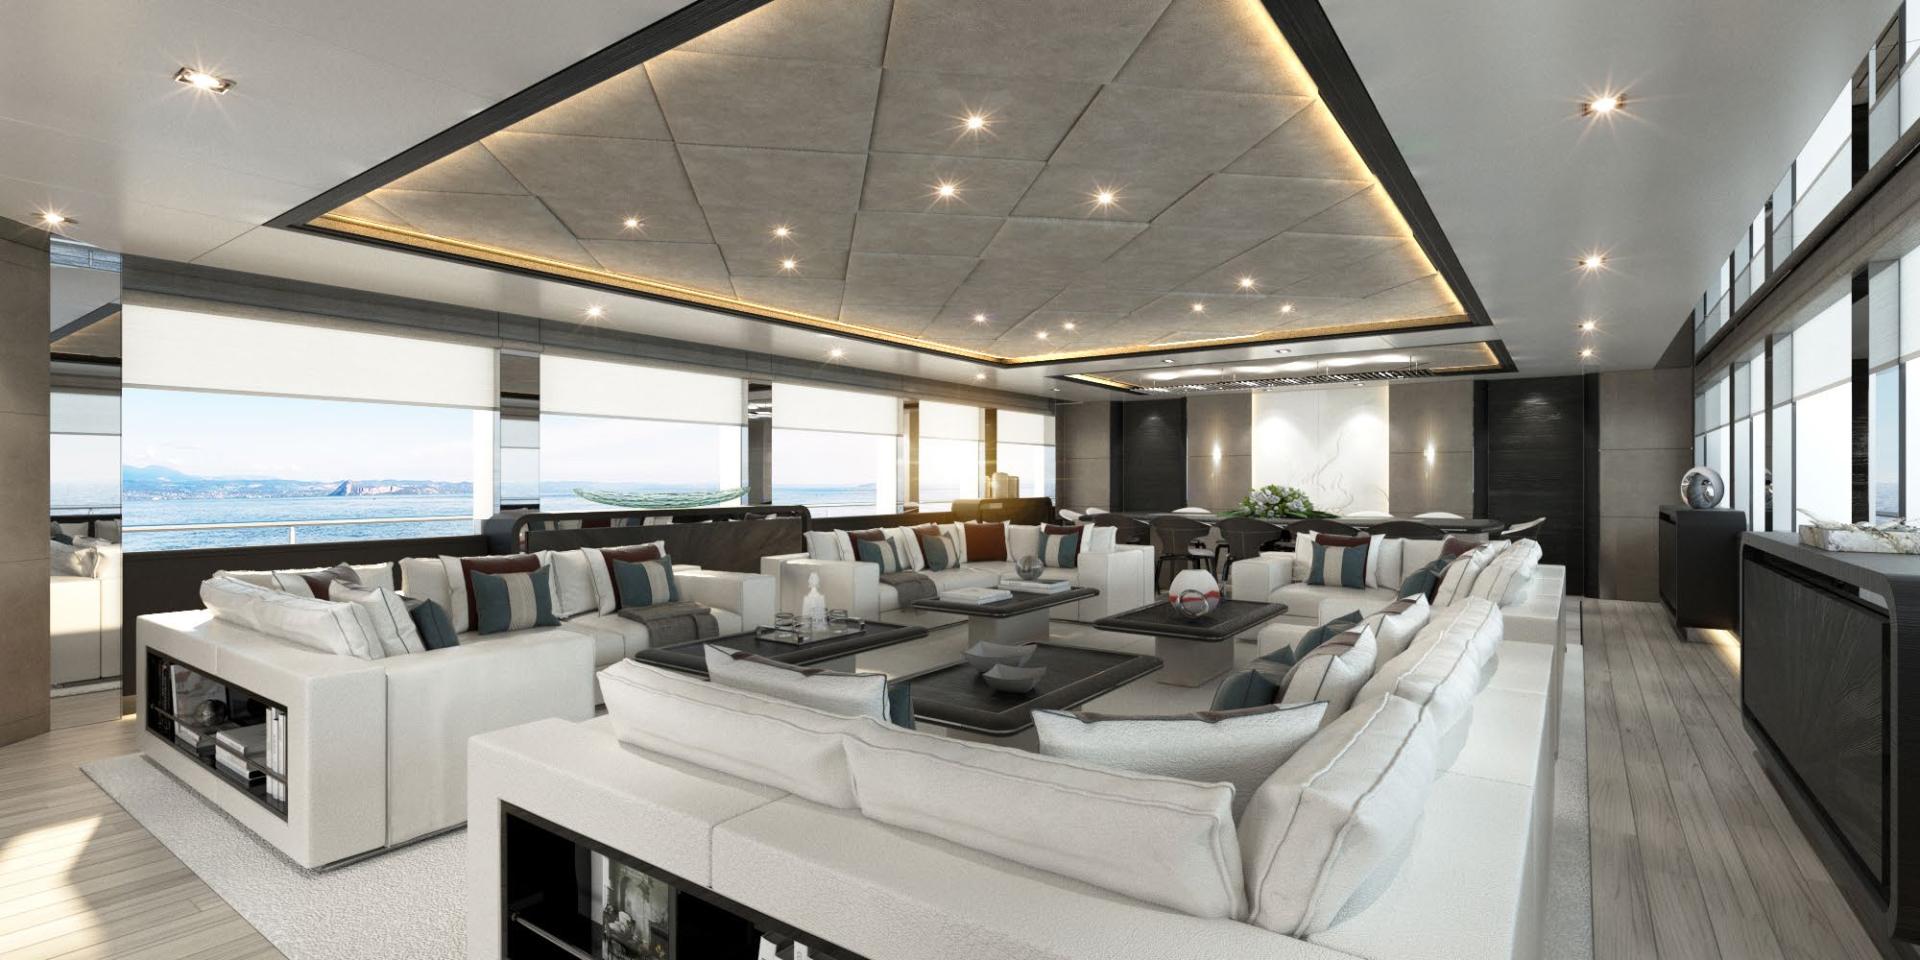 Majesty Yachts-Tri-Deck 2020-MAJESTY 175 United Arab Emirates-Main Salon-1376221 | Thumbnail